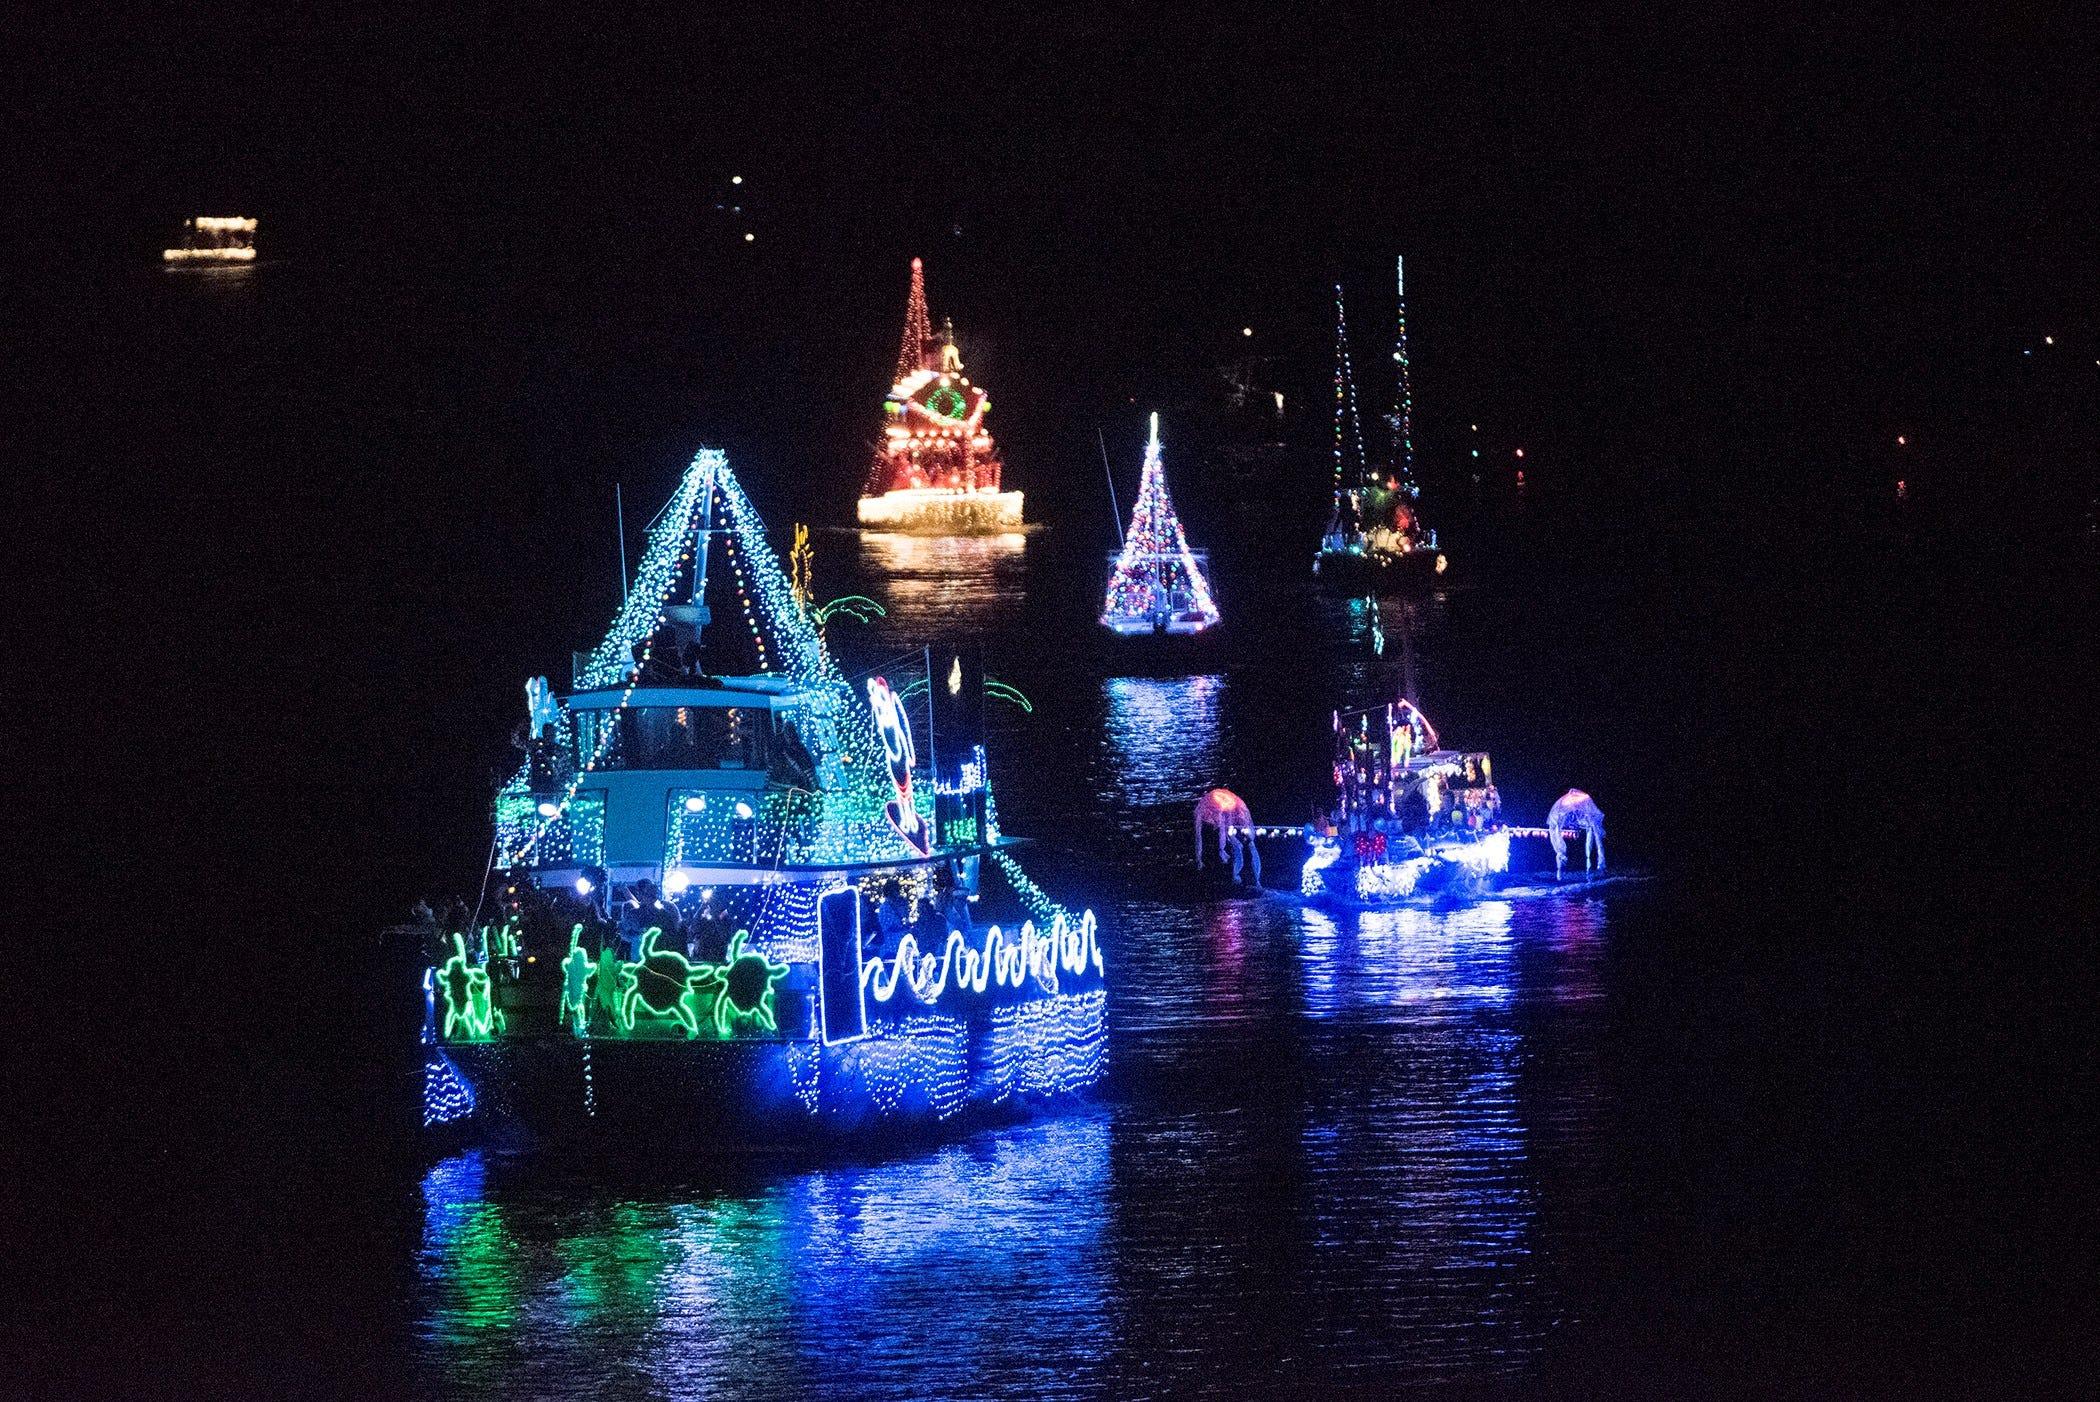 Dog River Christmas Boat Parade 2021 Holiday Boat Parade Returns For 26th Year